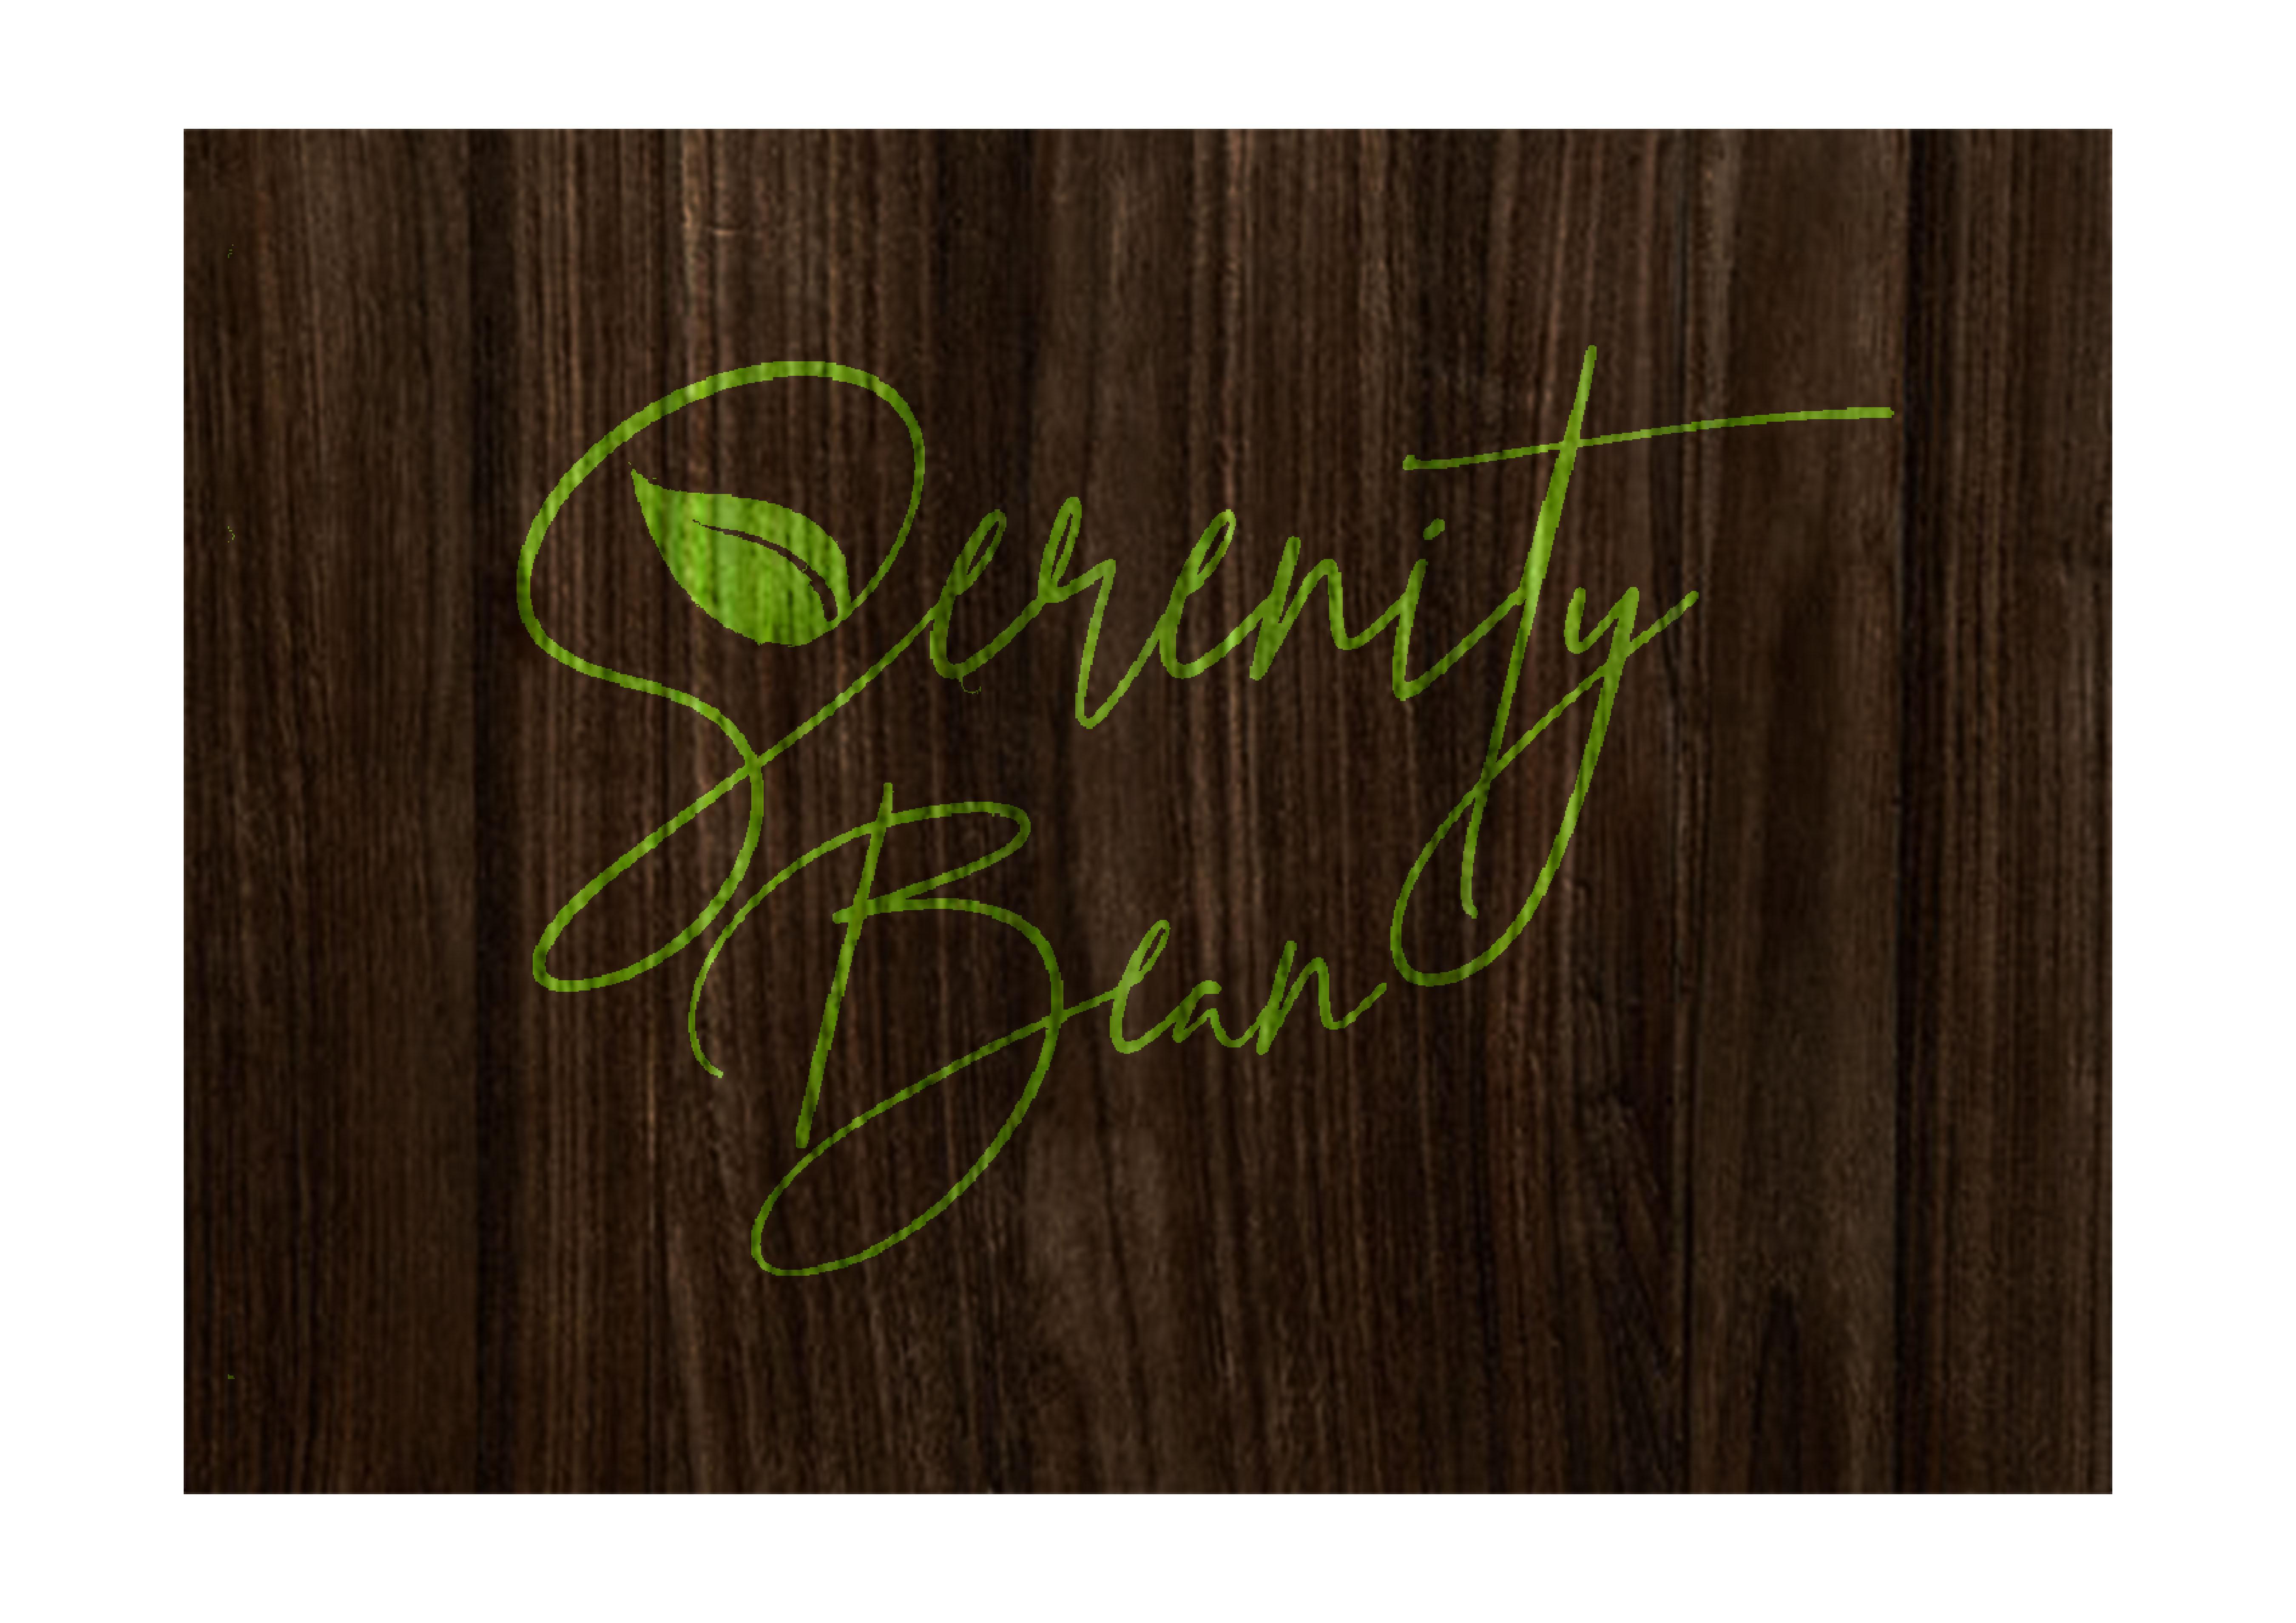 Serenity Bean